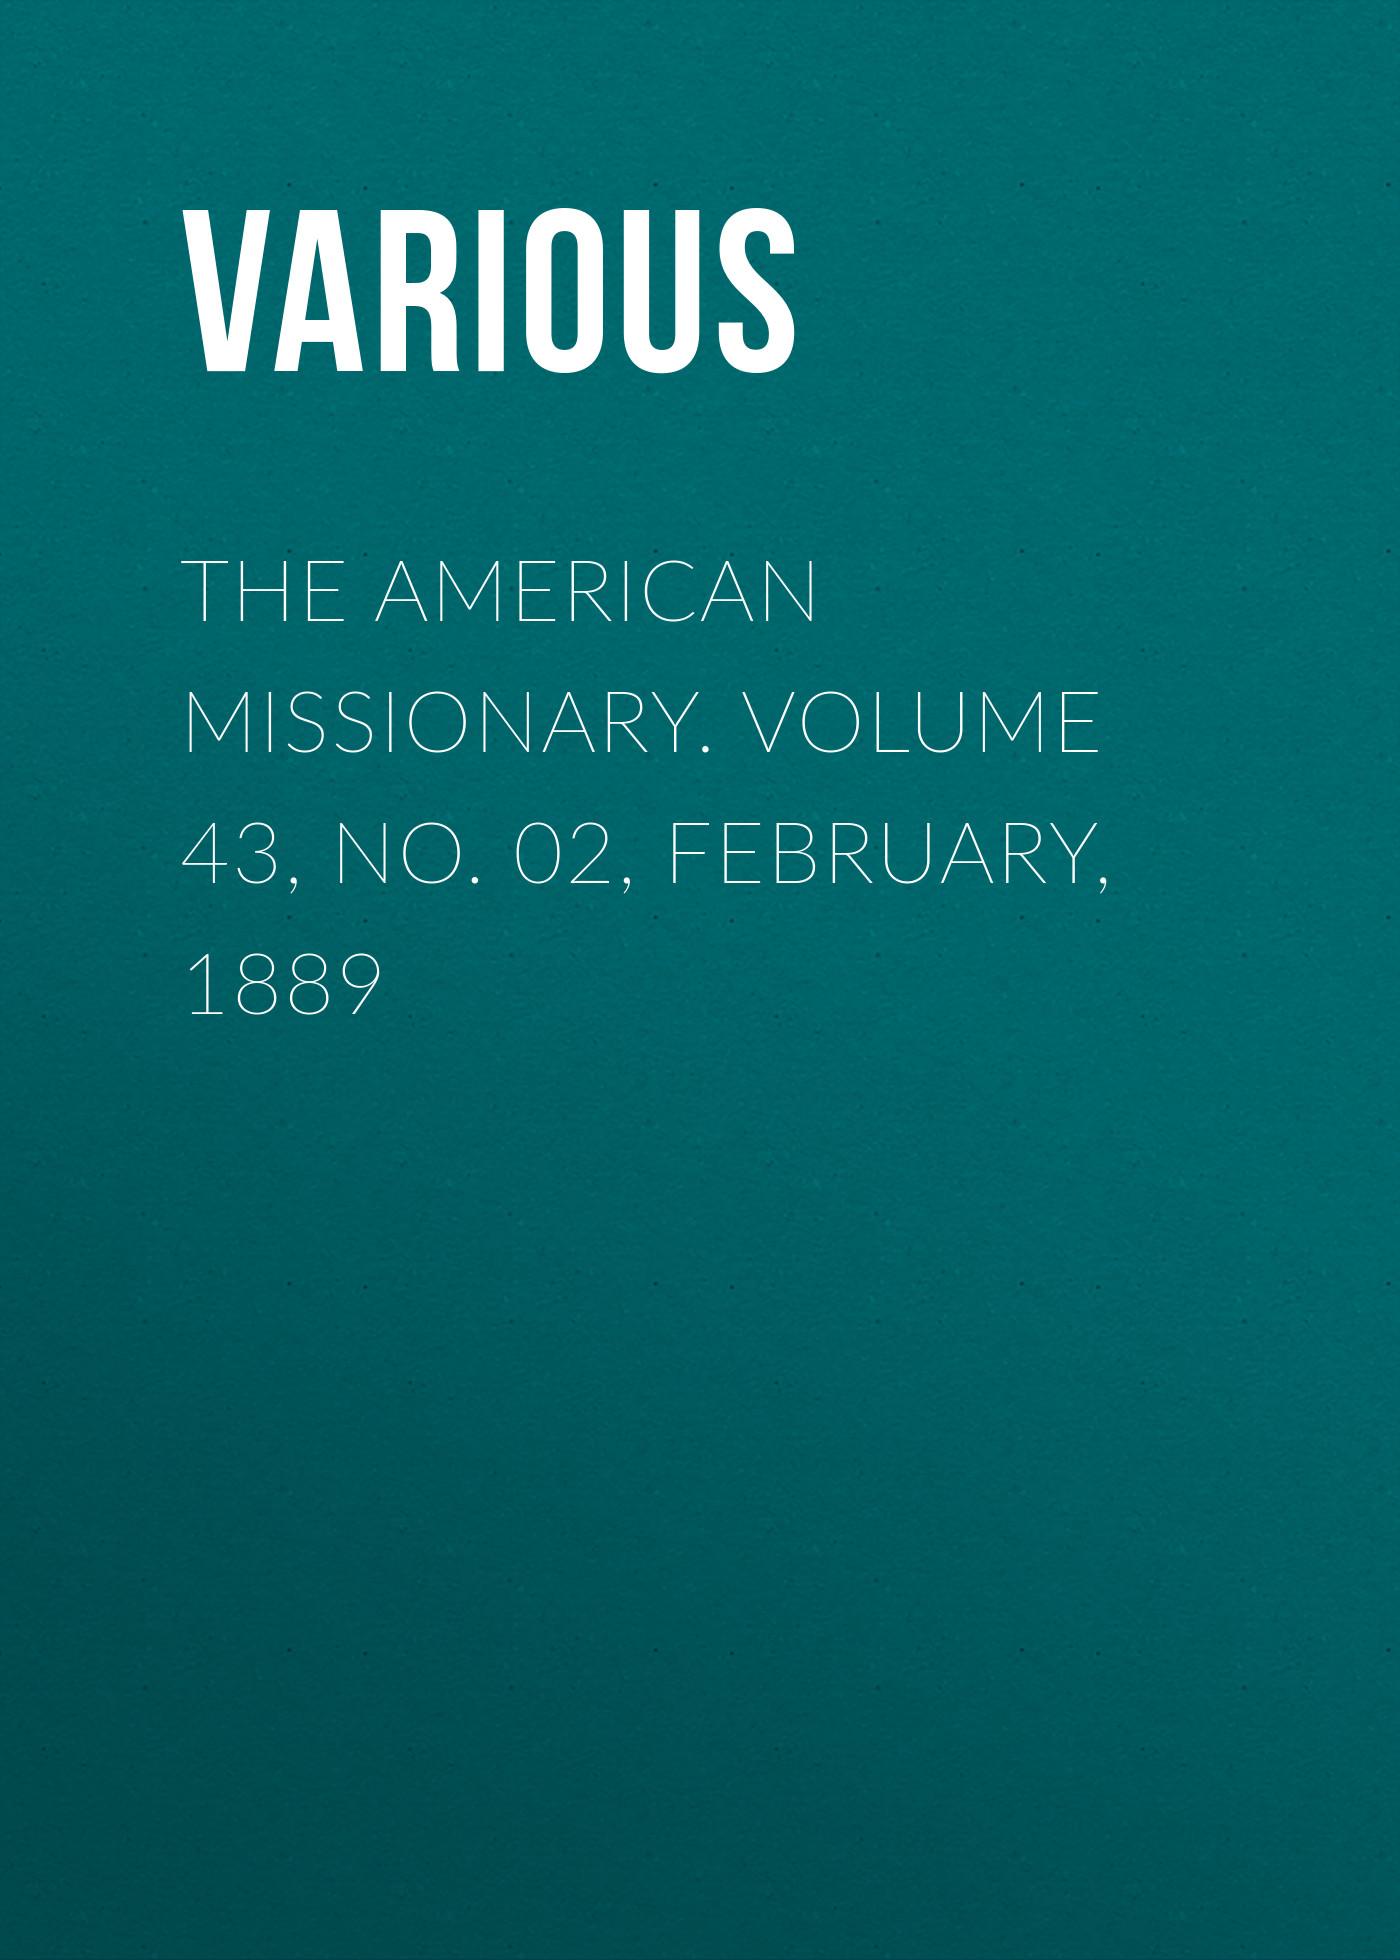 лучшая цена Various The American Missionary. Volume 43, No. 02, February, 1889